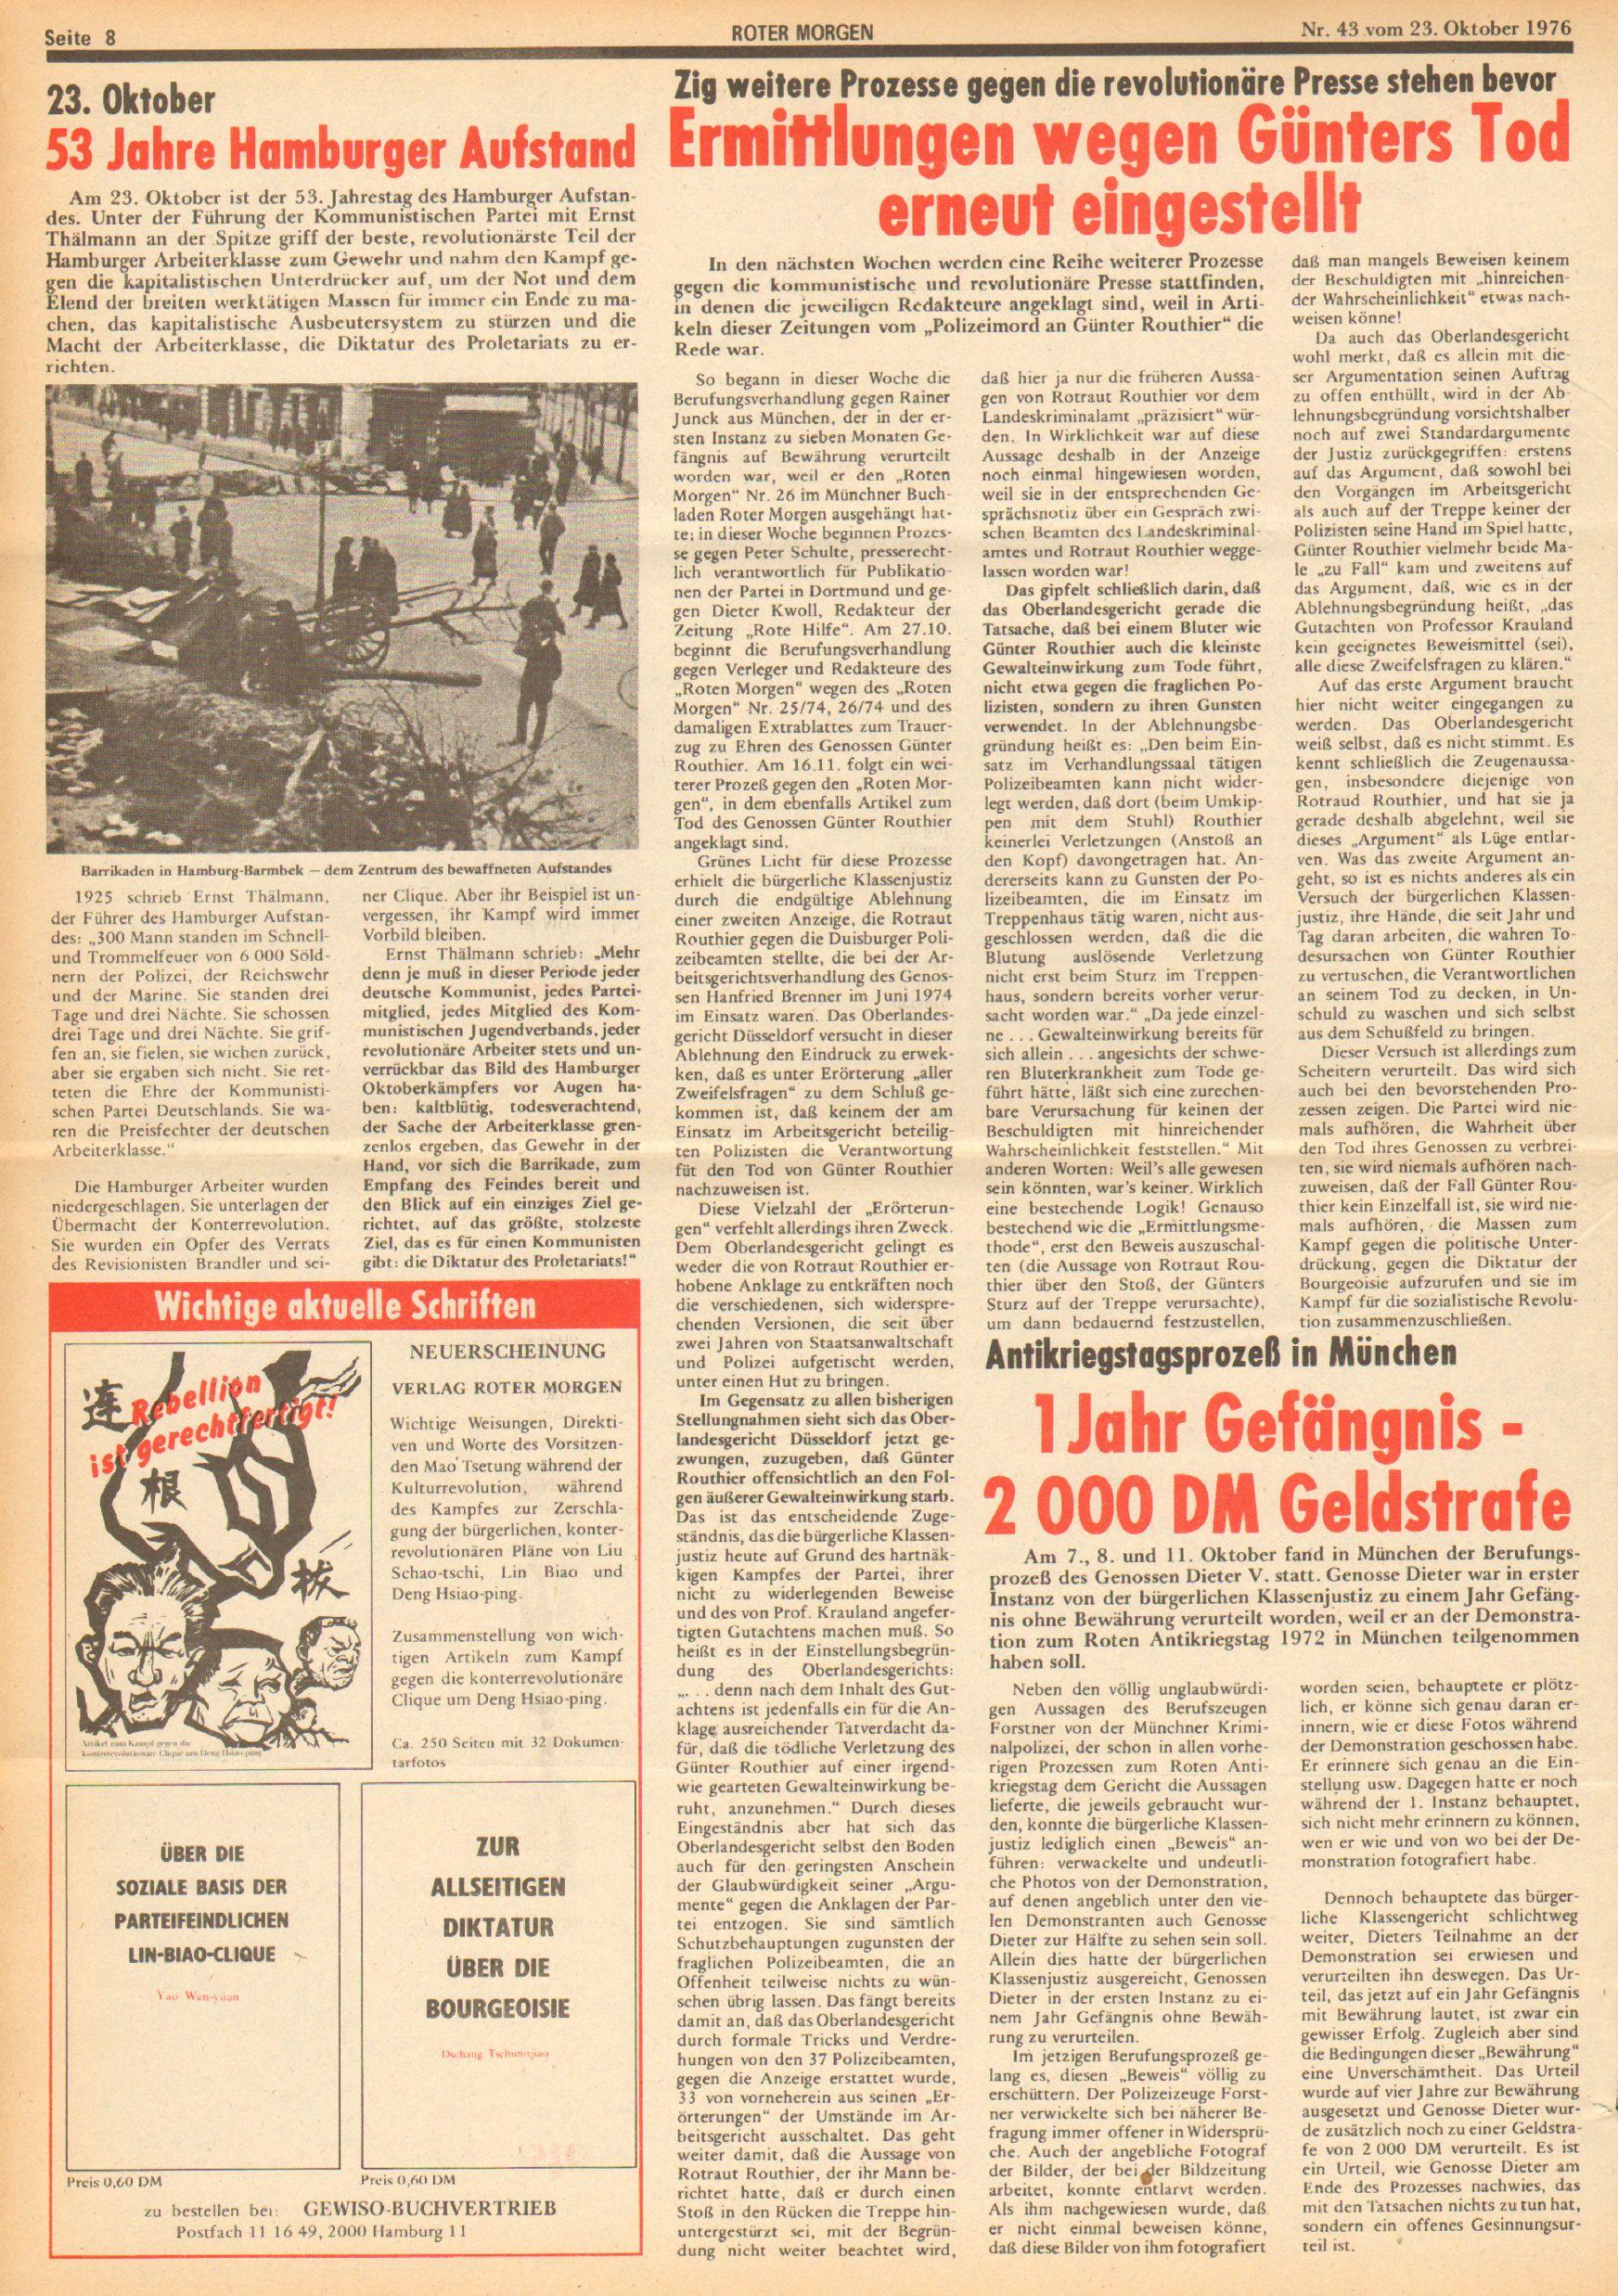 Roter Morgen, 10. Jg., 23. Oktober 1976, Nr. 43, Seite 8